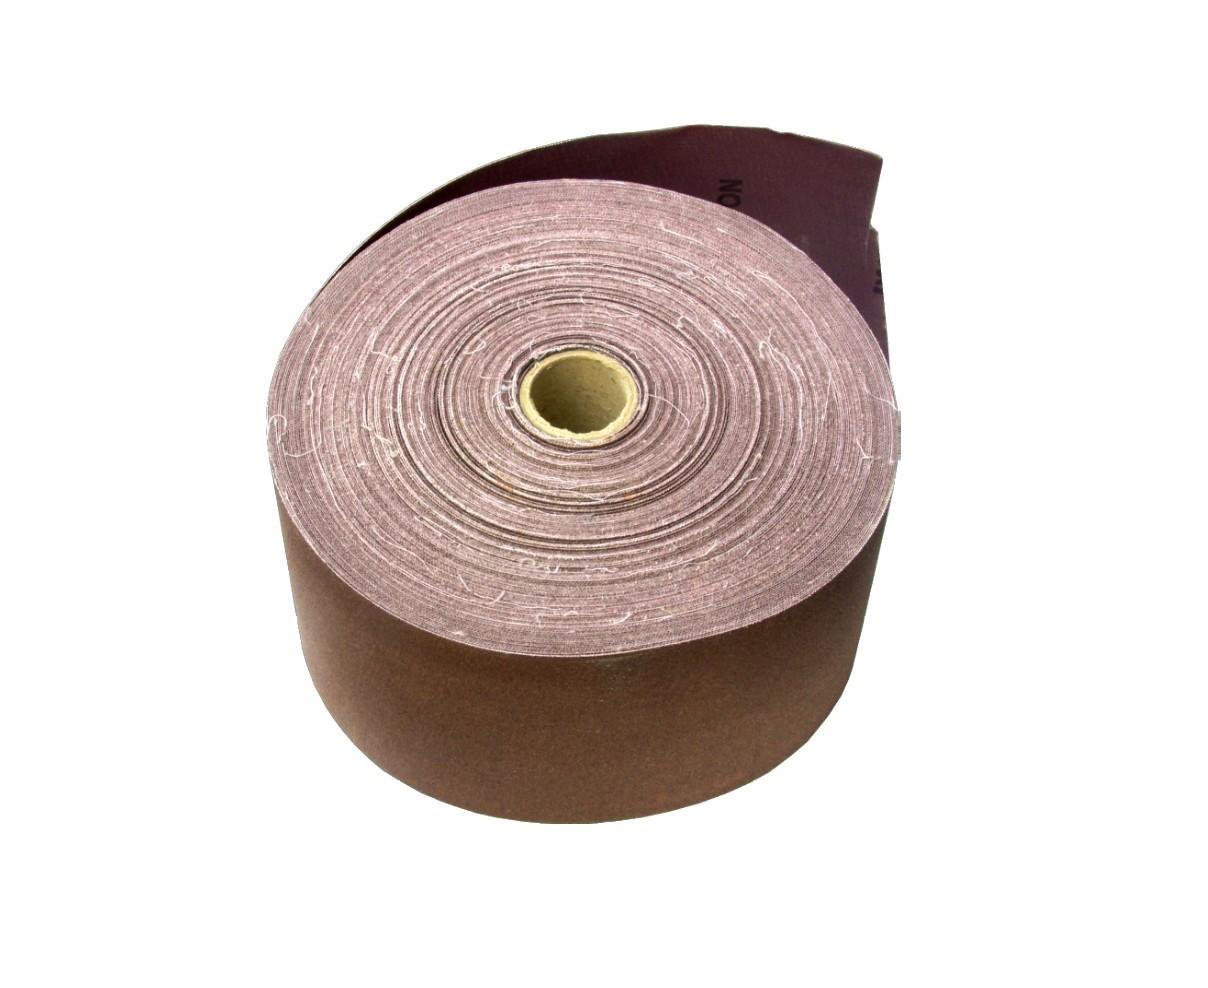 Smirghel Universal pe Suport Textil ETS Lungime 50m, Latime 100mm, Granulatie 40 imagine techstar.ro 2021